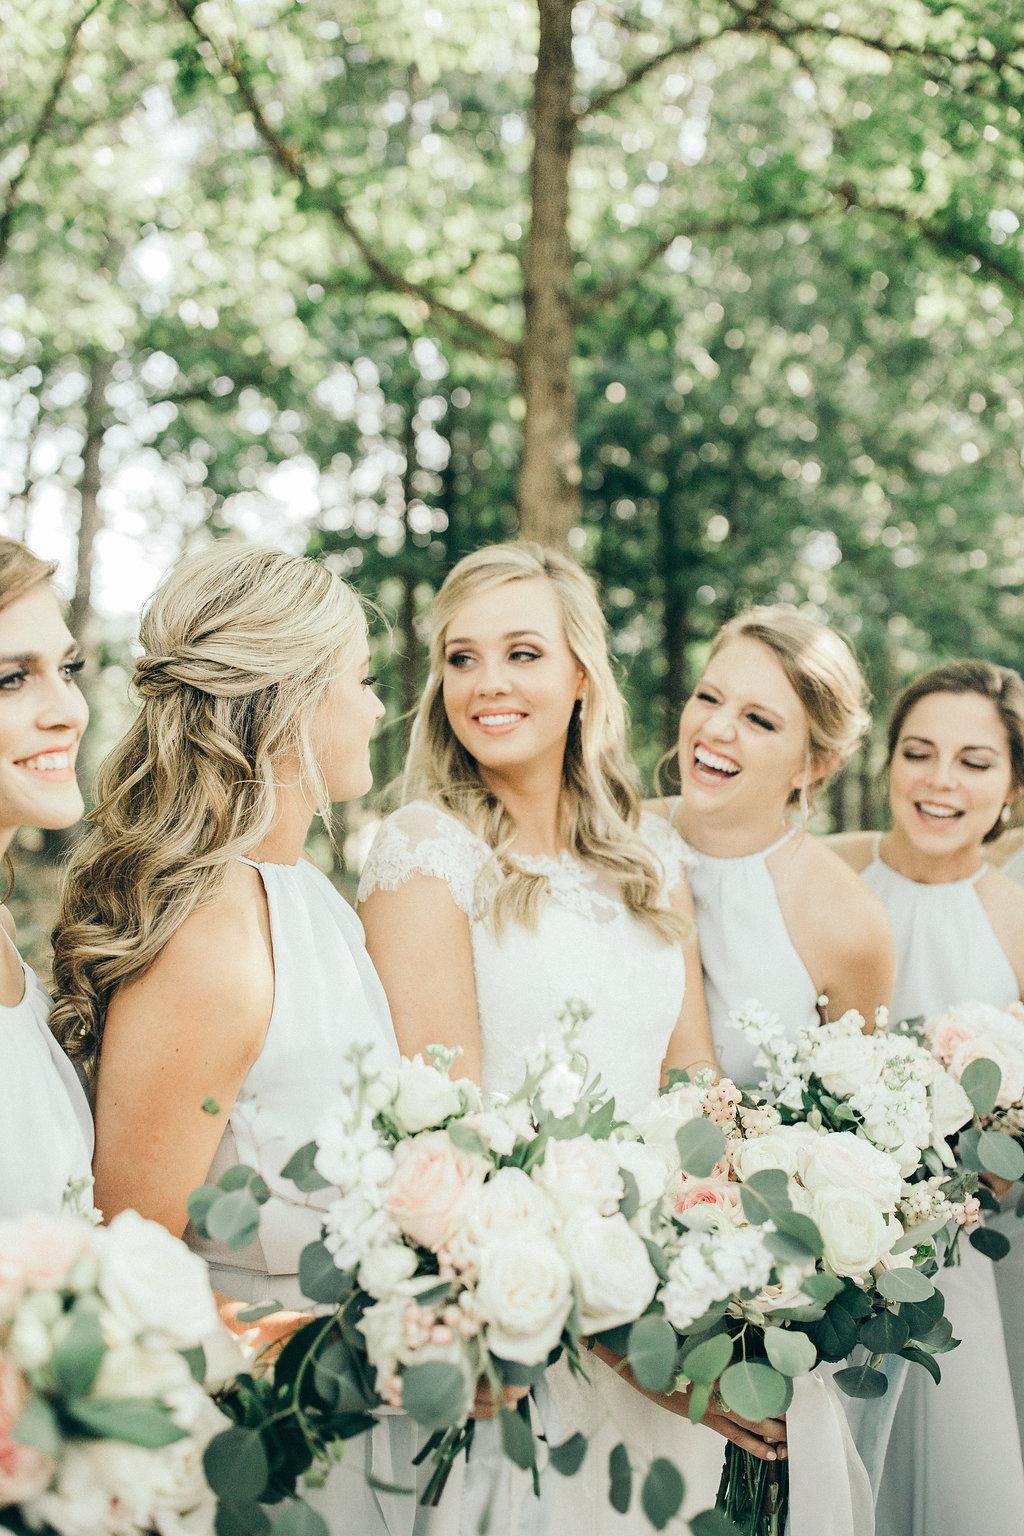 Auburn Al bride and bridesmaids